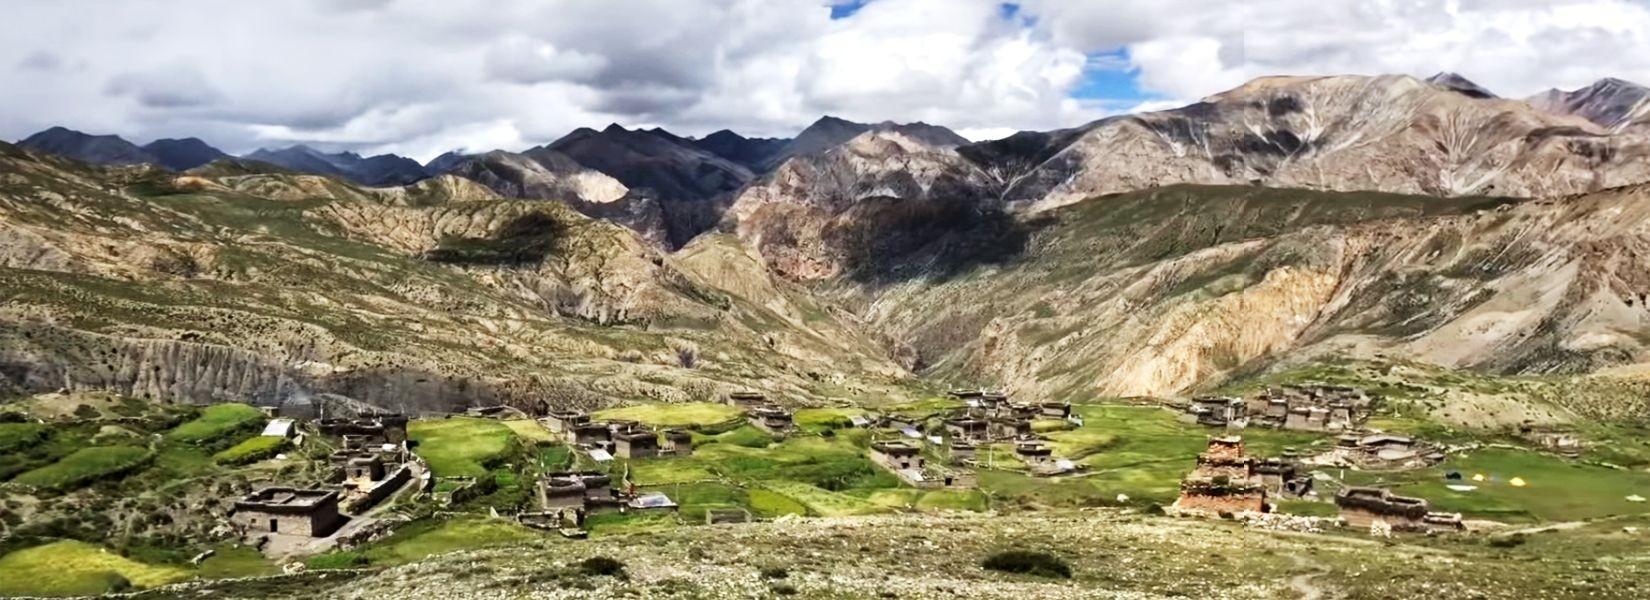 Dolpa Nepal, Upper Dolpa, Dolpo Trek